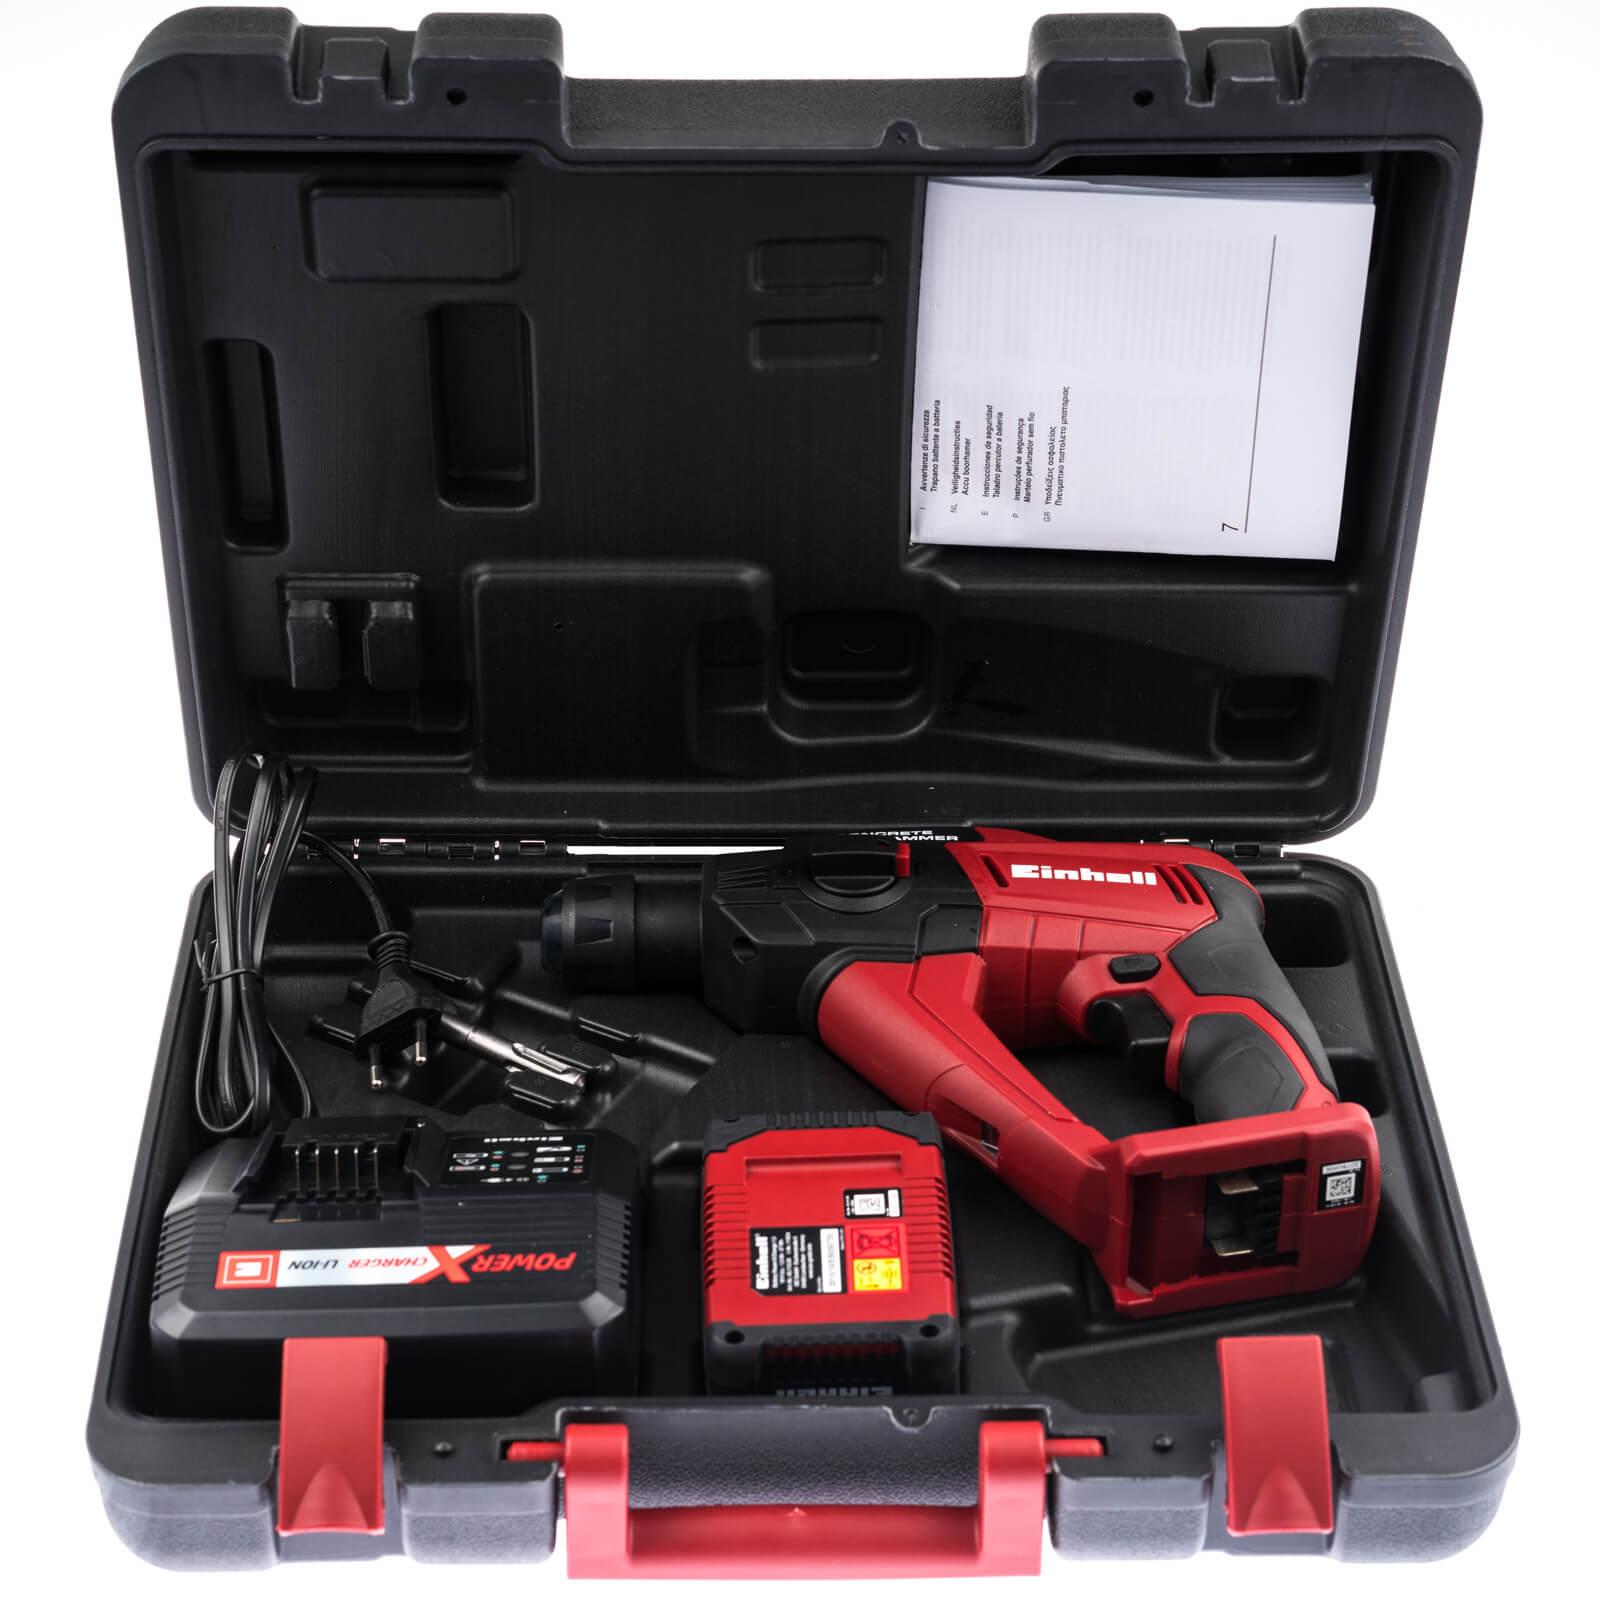 te-hd 18 li akku-bohrhammer und akku power x change | werkzeuge-berlin